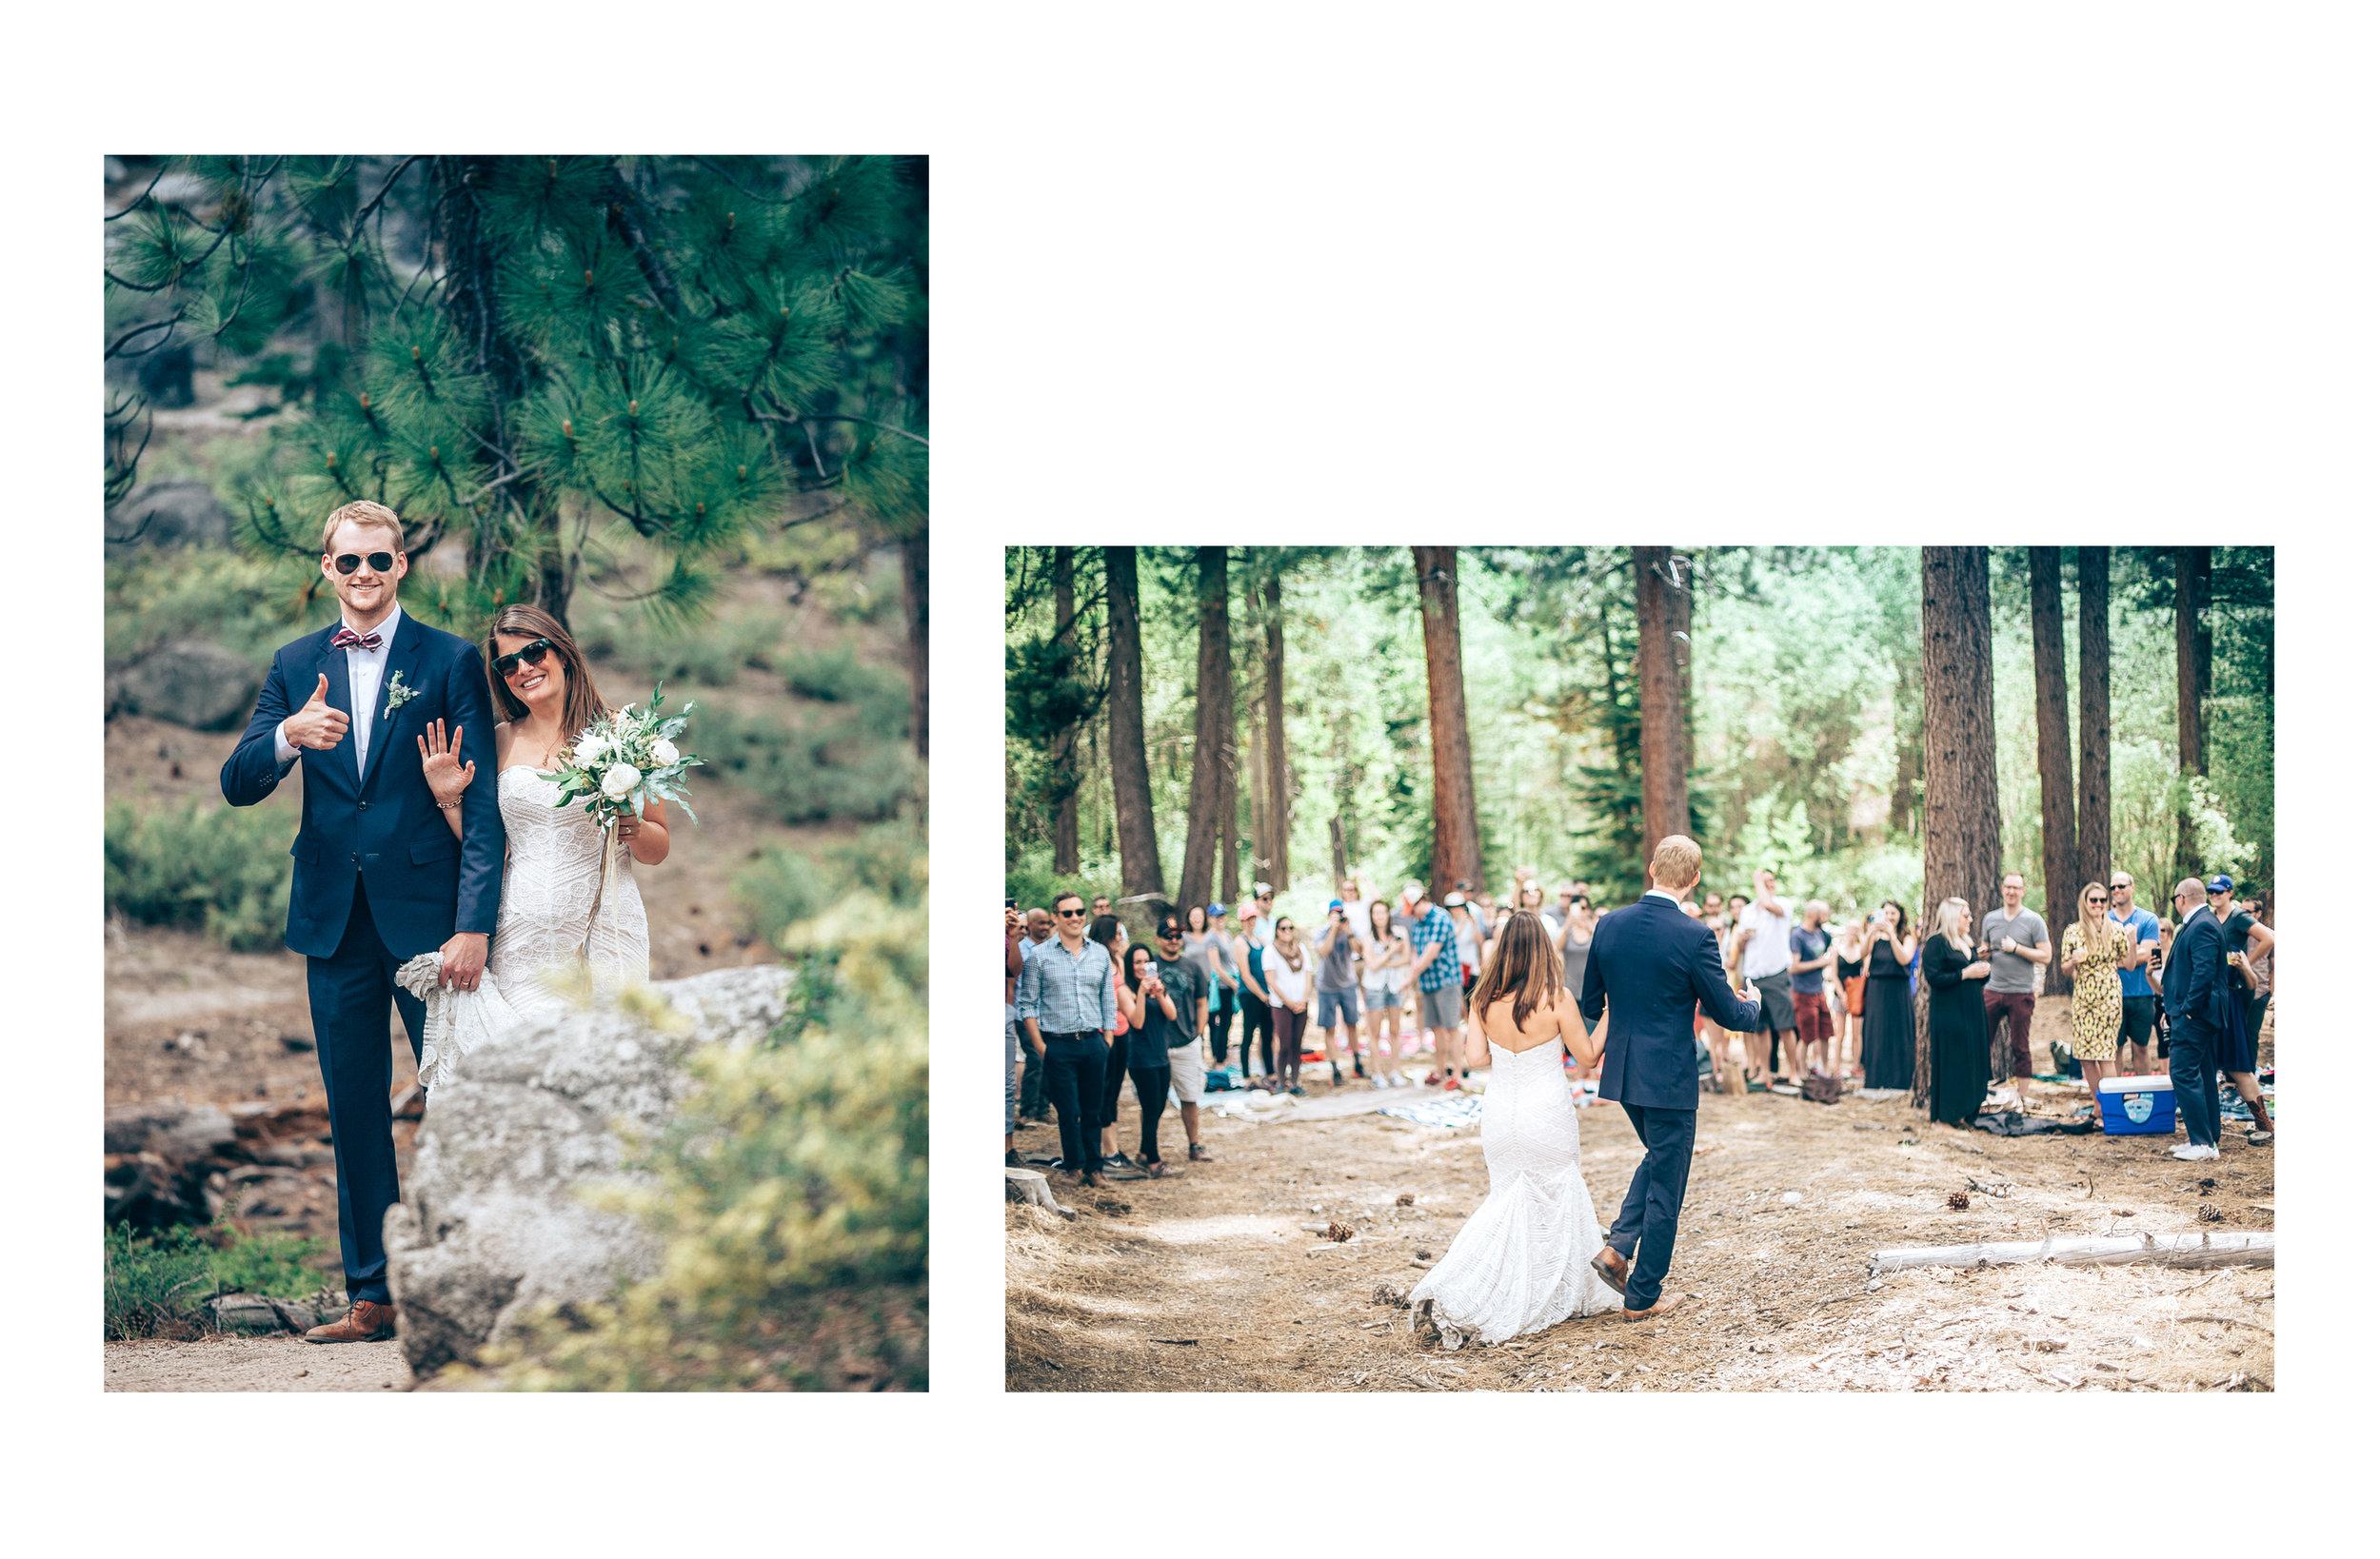 Melisa&David_Wedding_Day_014.jpg